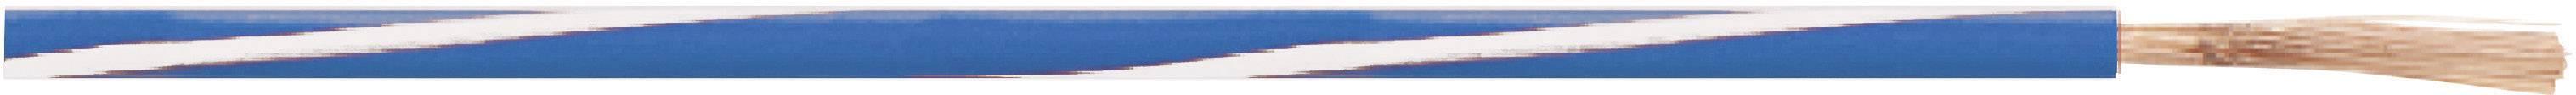 Opletenie / lanko LappKabel 4512321S X05V-K, 1 x 0.50 mm², vonkajší Ø 2.10 mm, metrový tovar, žltá, biela